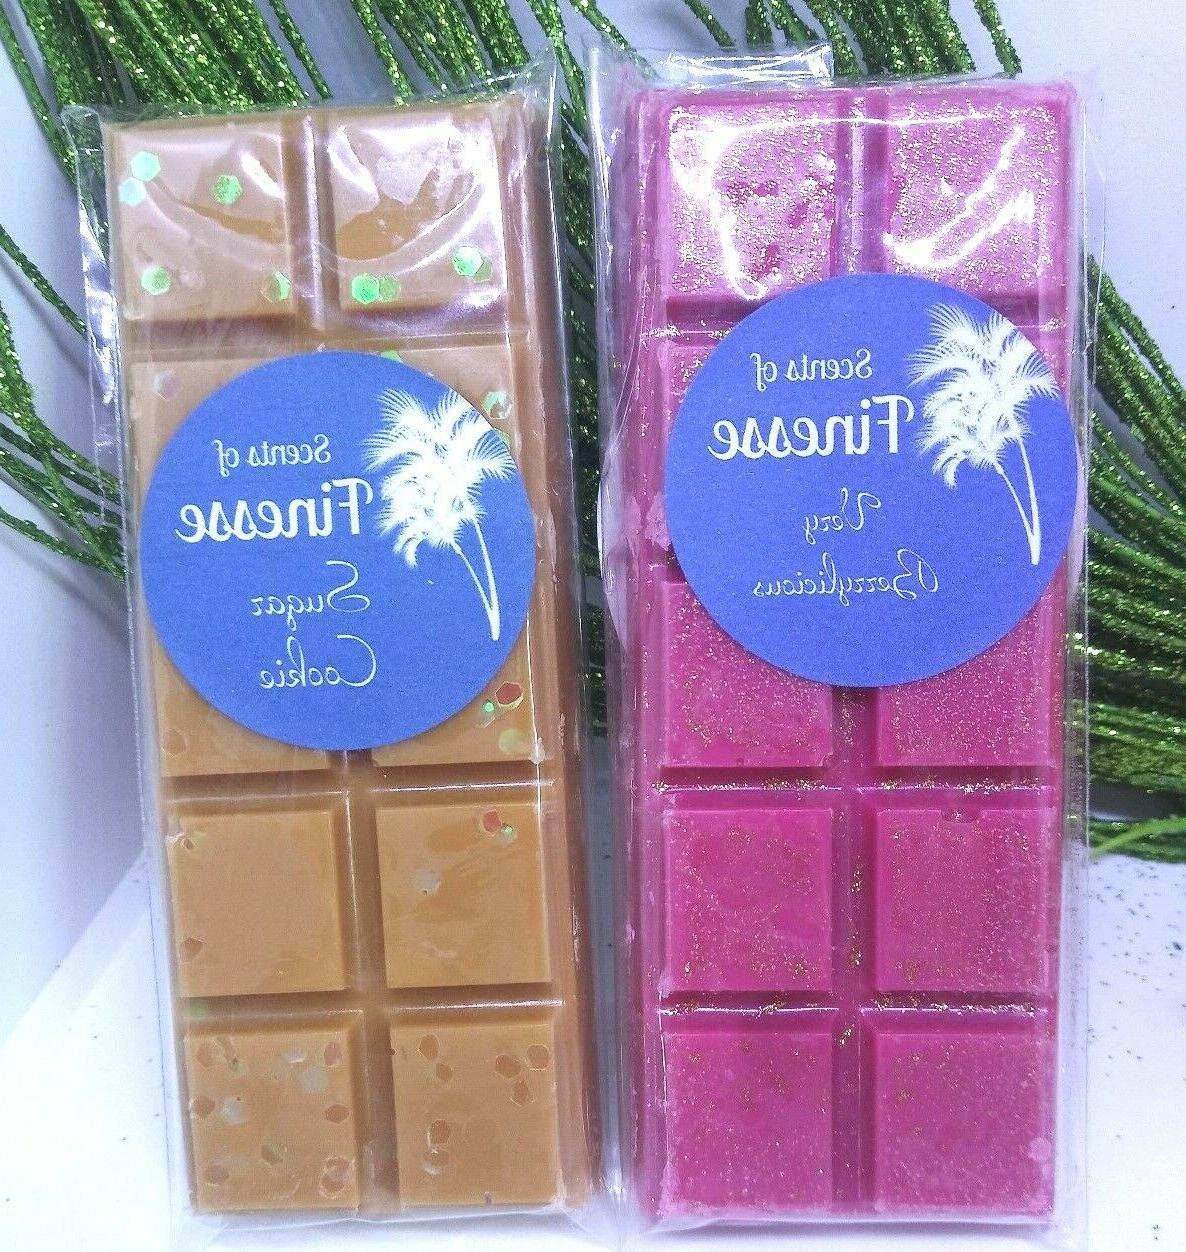 WAX MELTS TARTS, Highly Fragranced, Hand you choose Beeswax